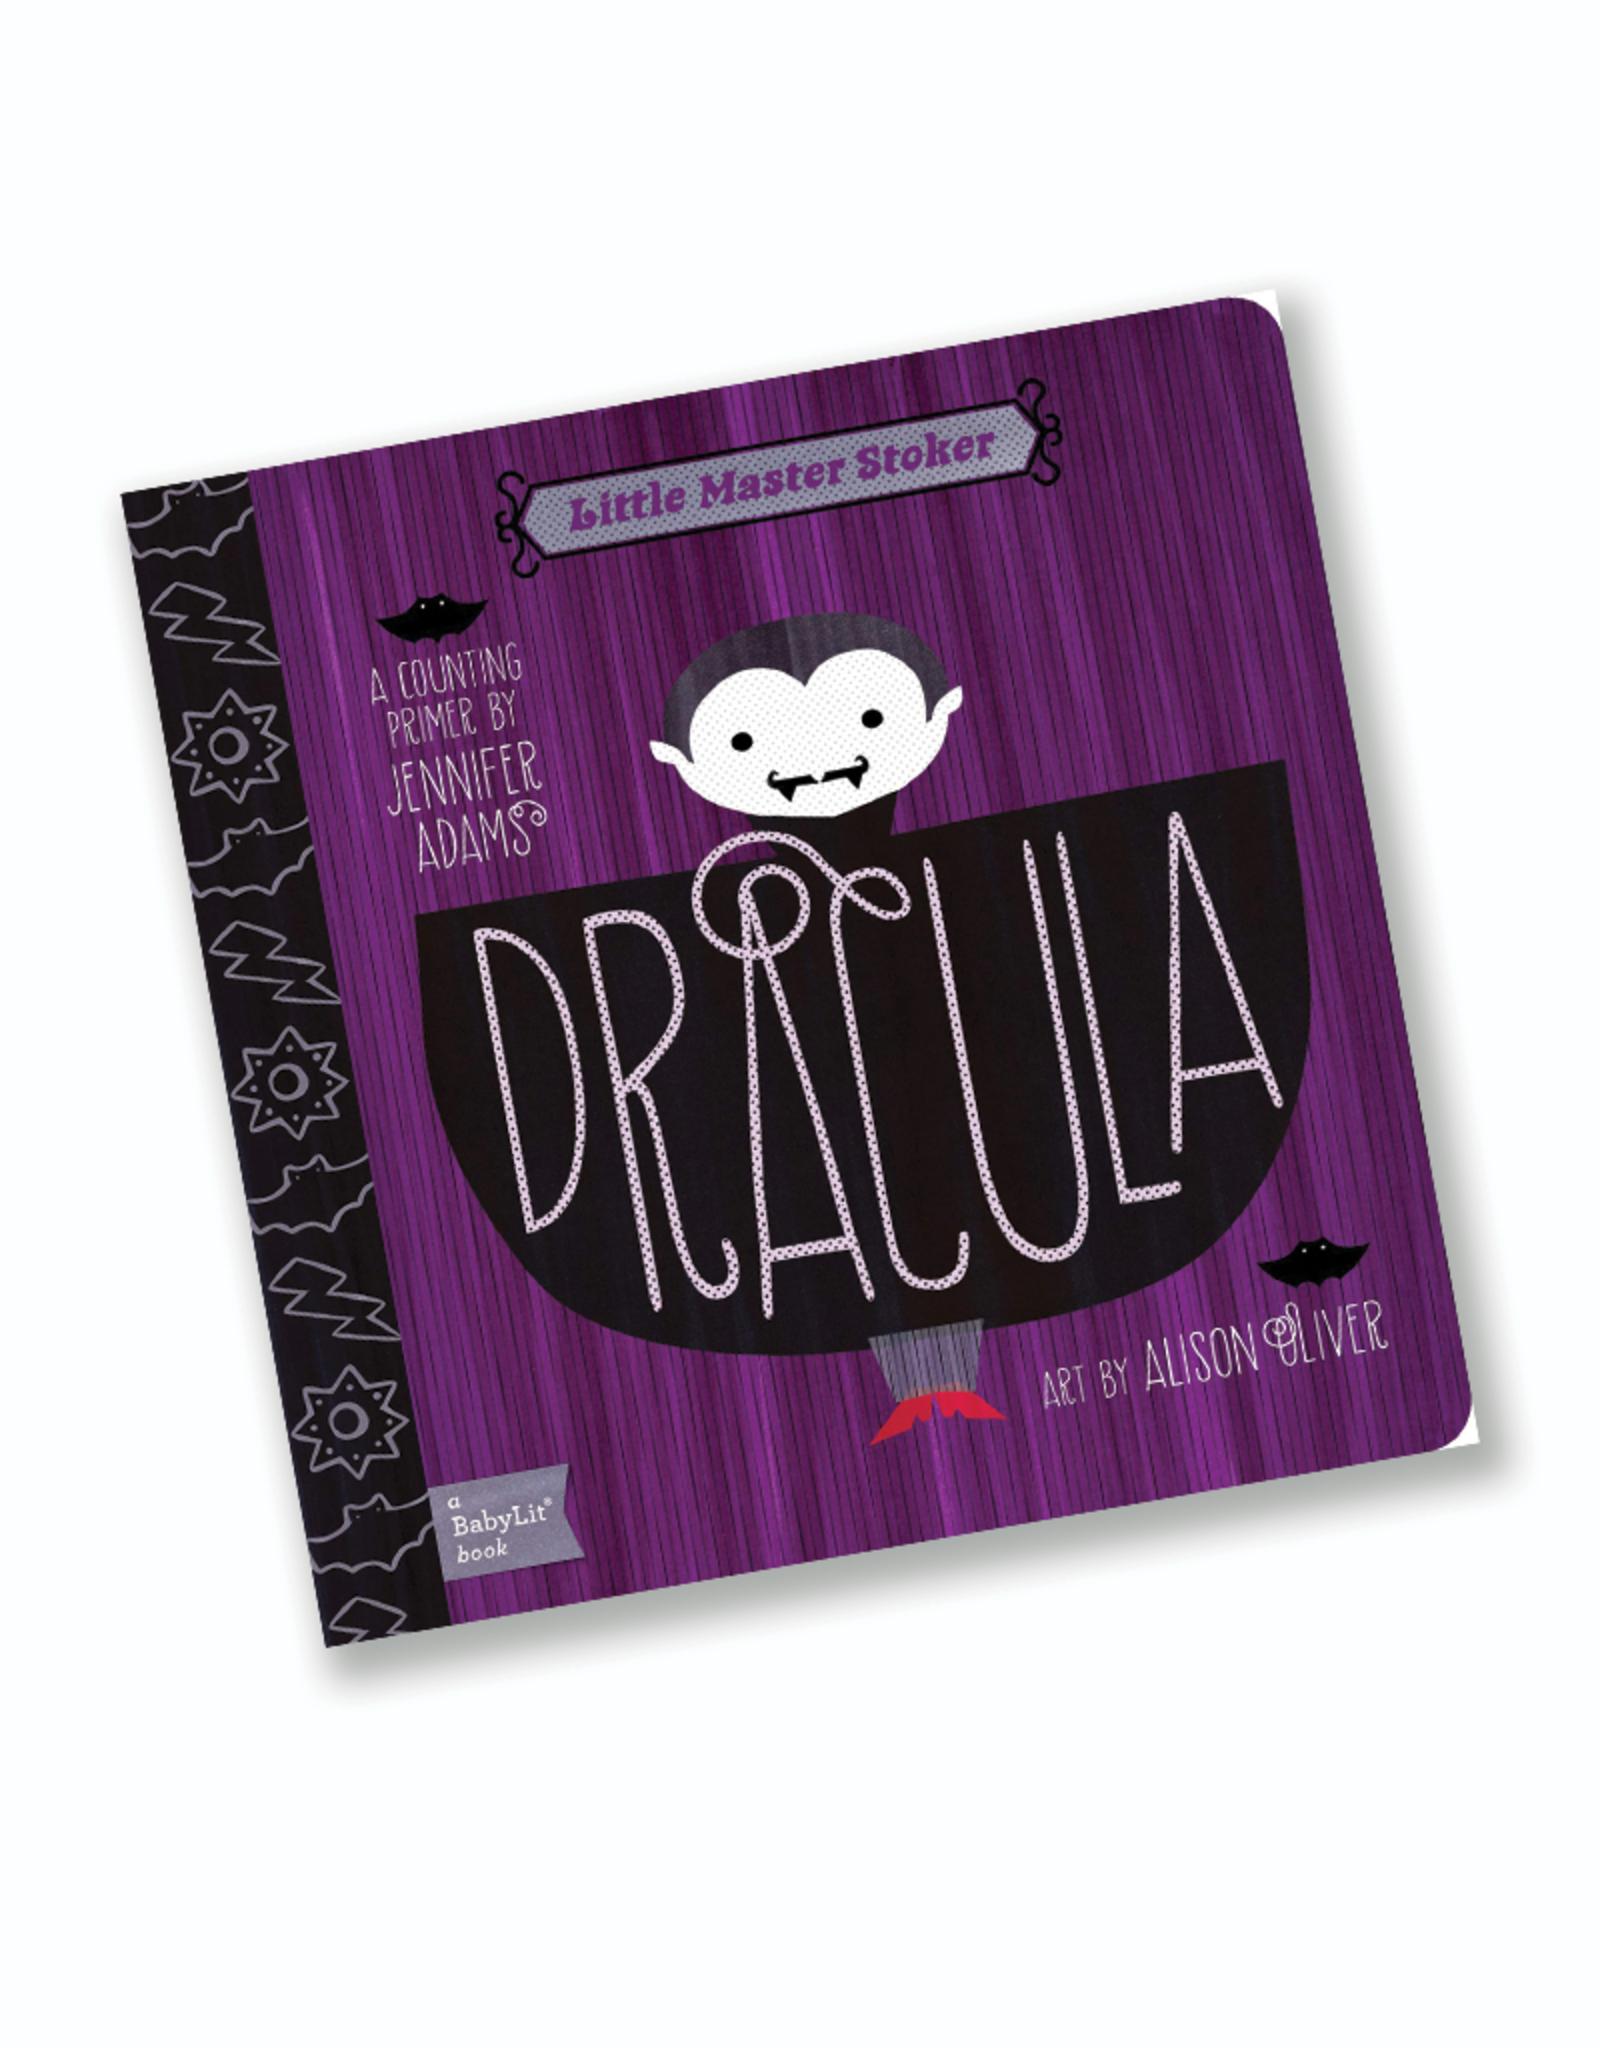 BabyLit Dracula: A BabyLit Counting Primer